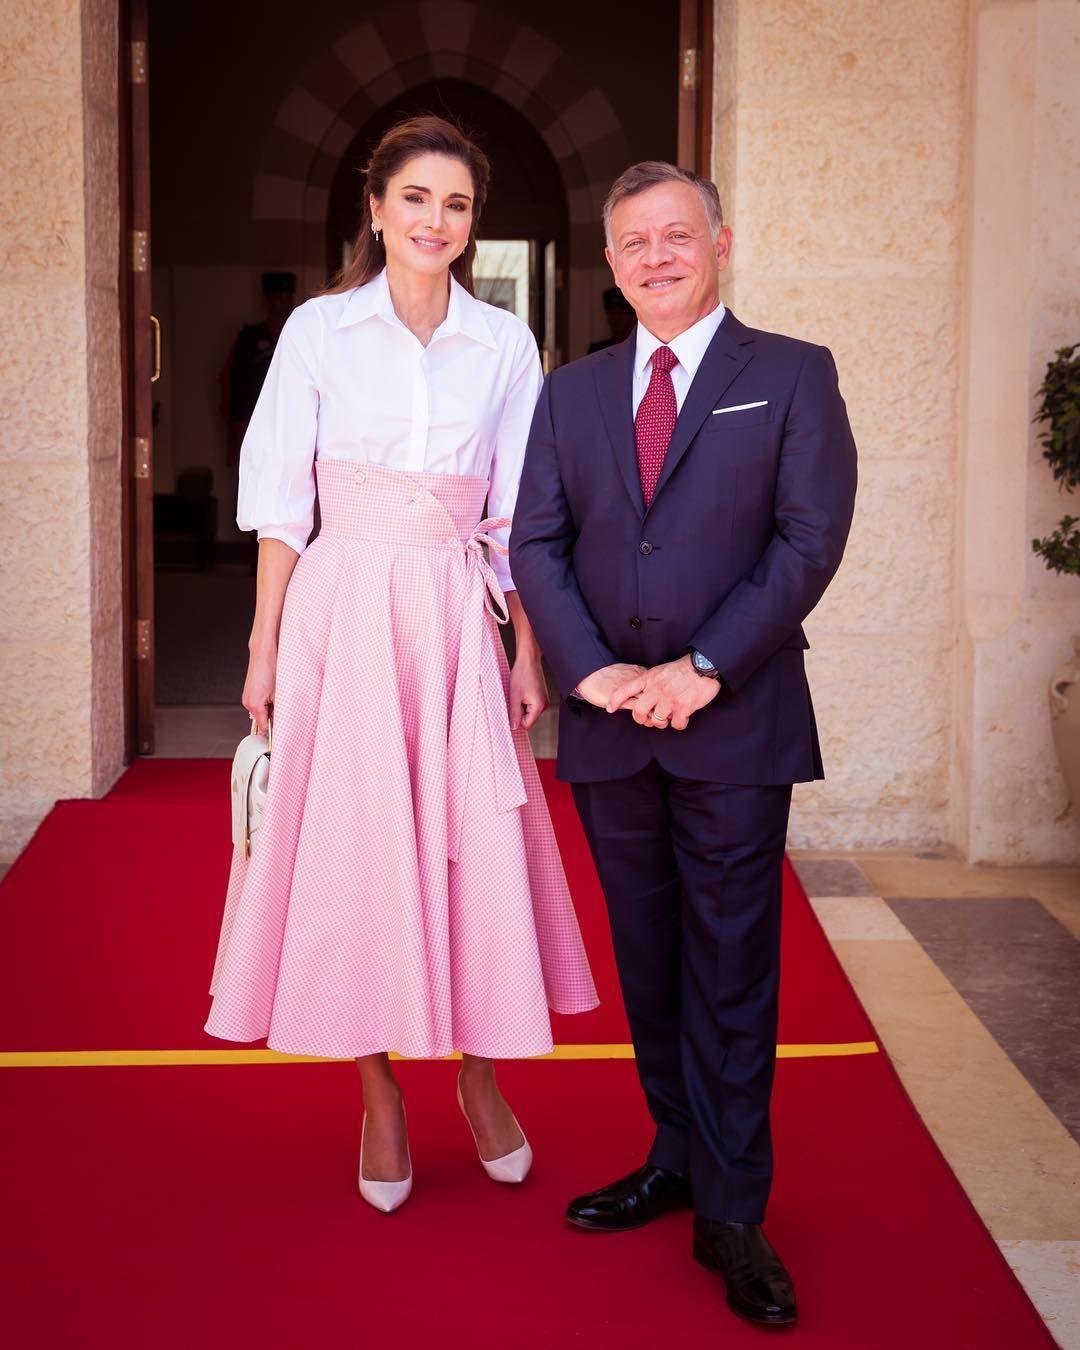 Queen Rania Of Jordan Channels A Modern Day Princess Grace Royal